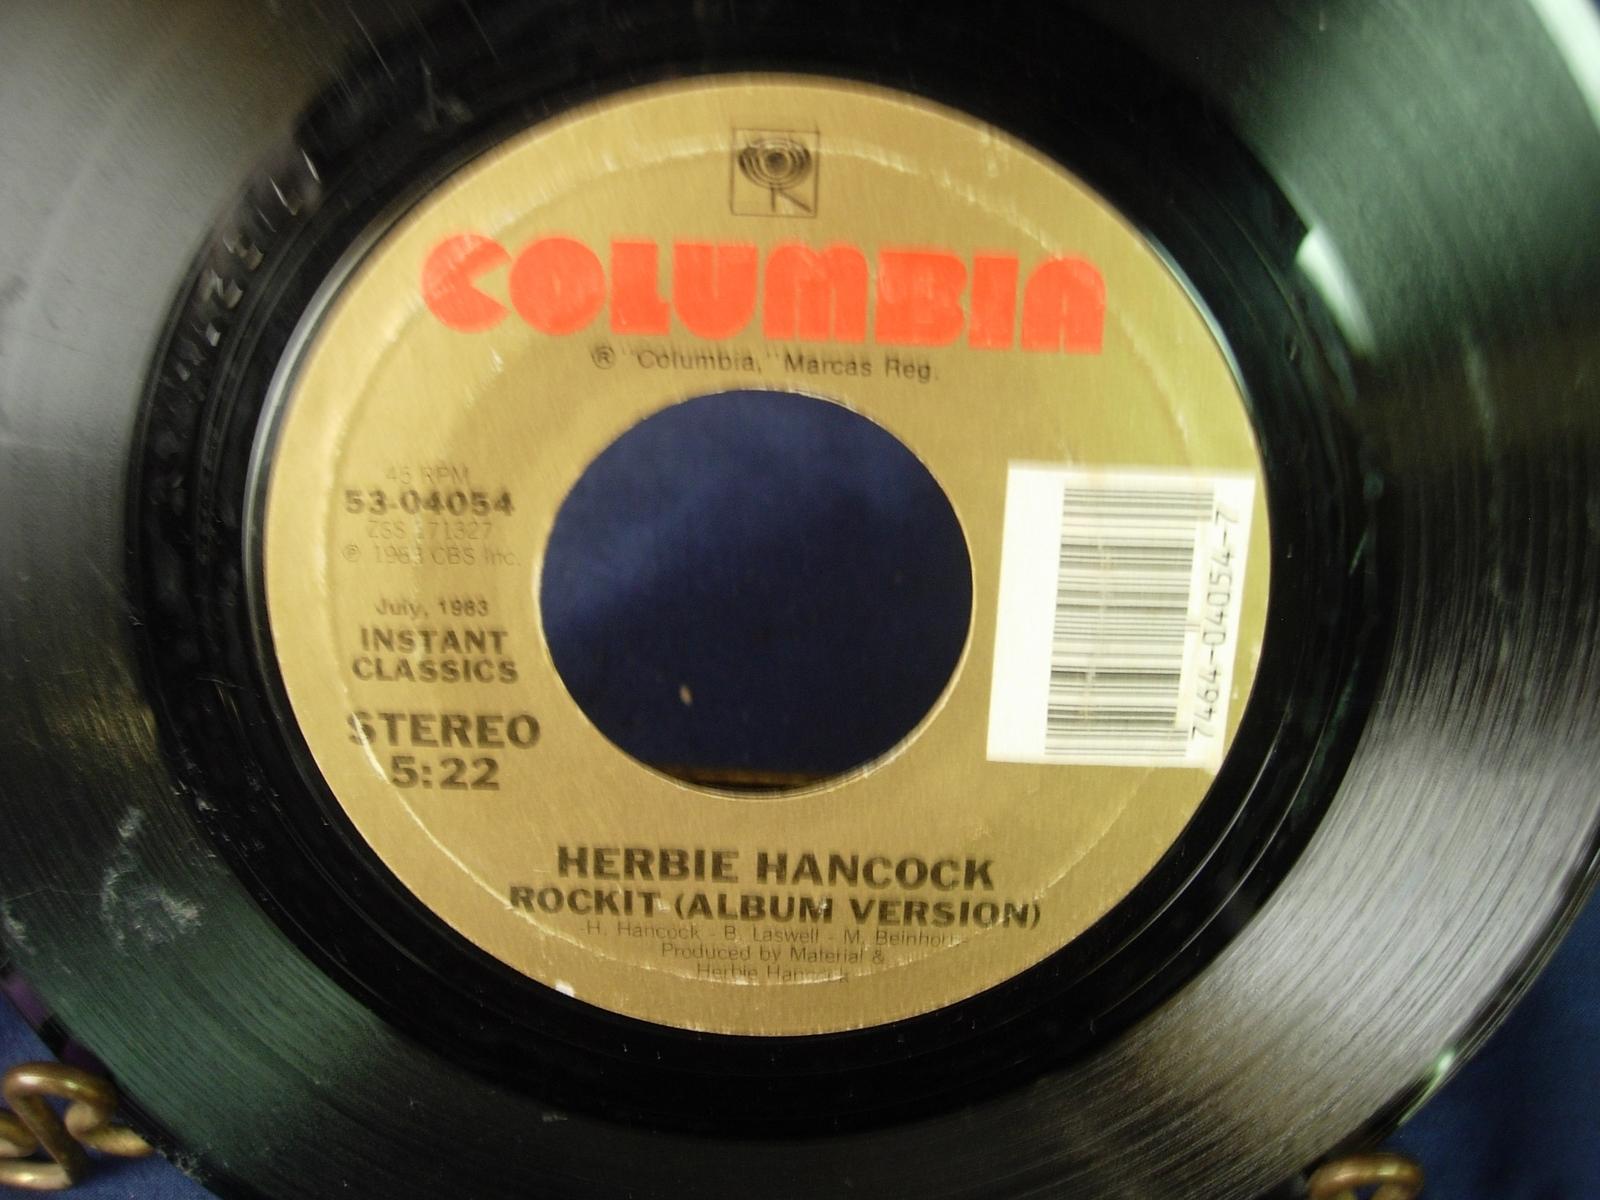 Herbie Hancock - Rockit - Columbia 53-04054